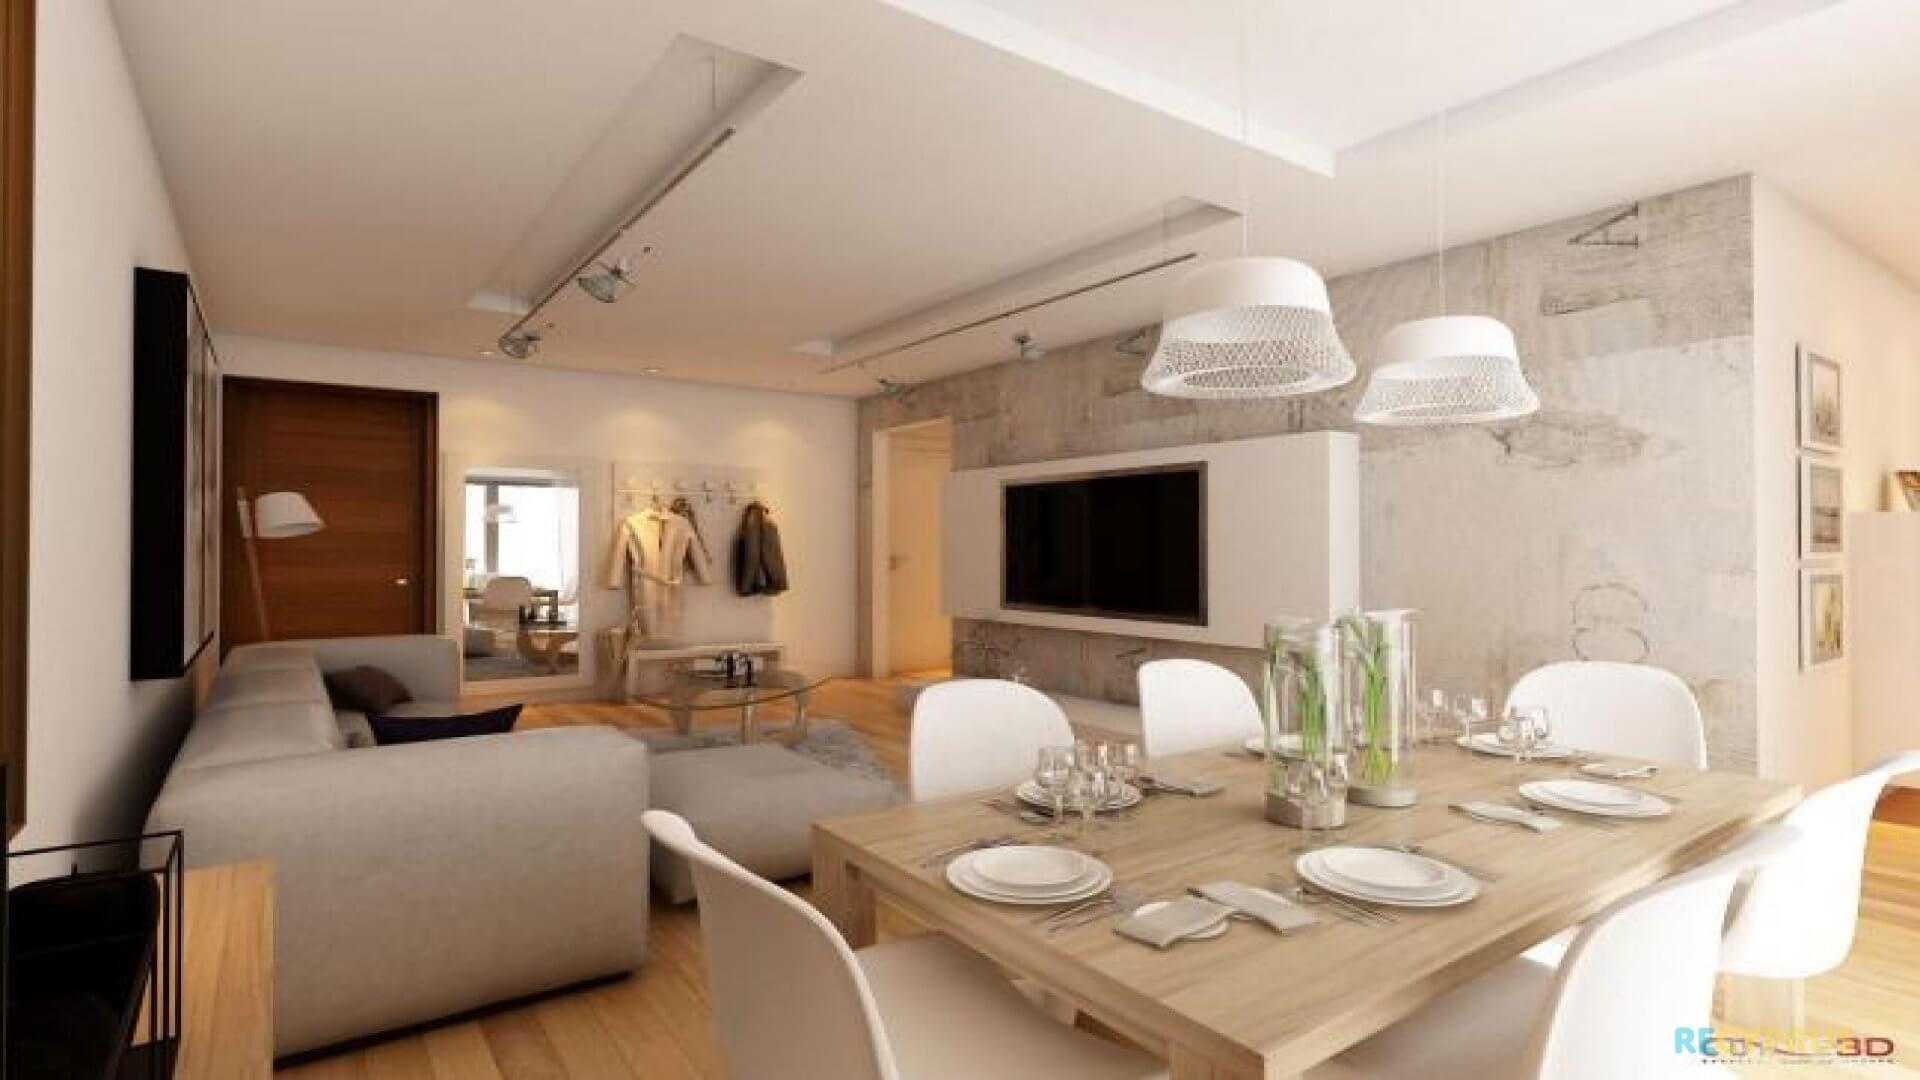 Apartment for sale City Center Larnaca Cyprus 1 3584